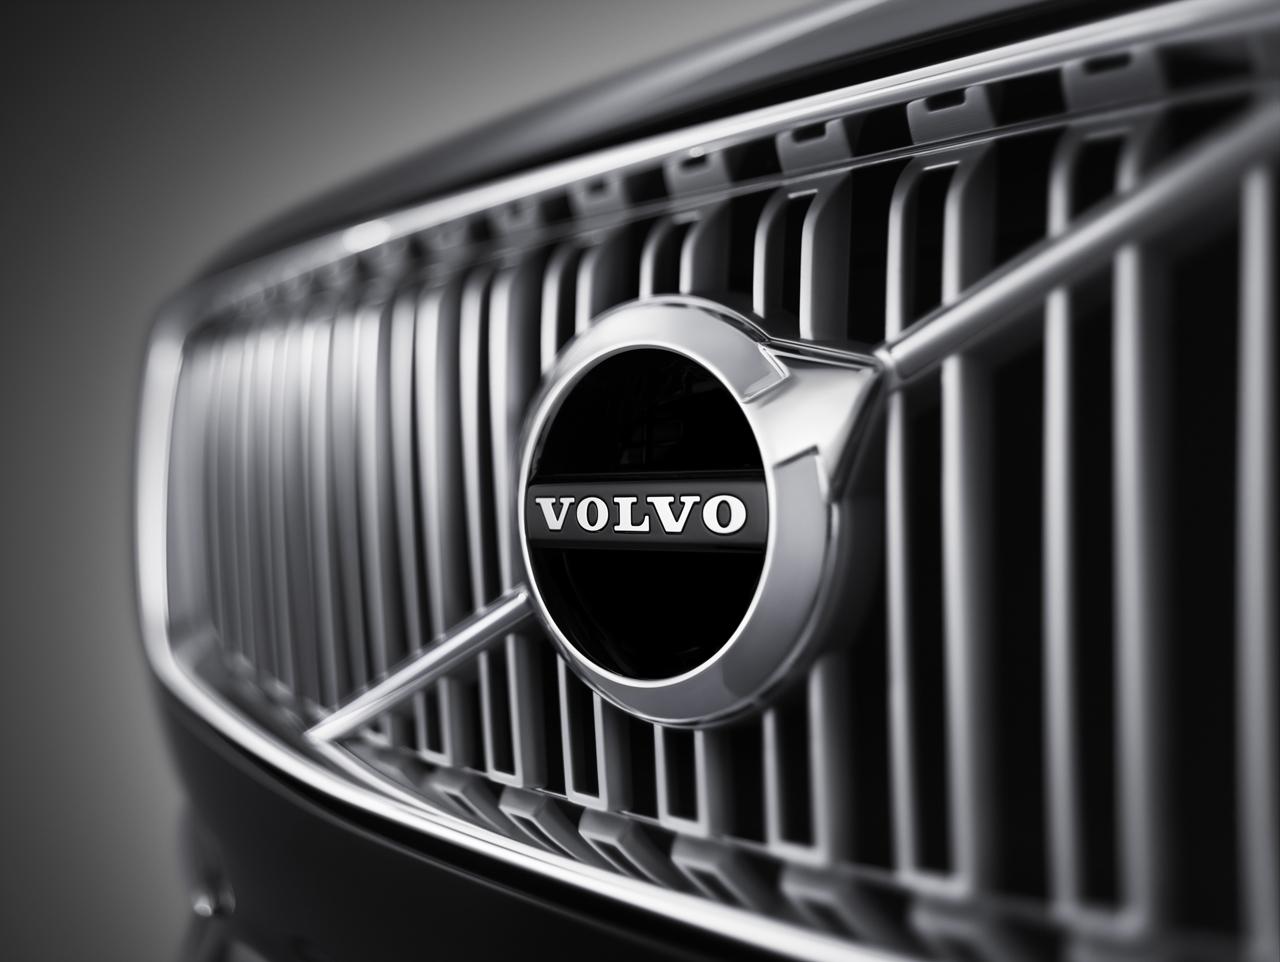 Volvo XC90 2015 frontal